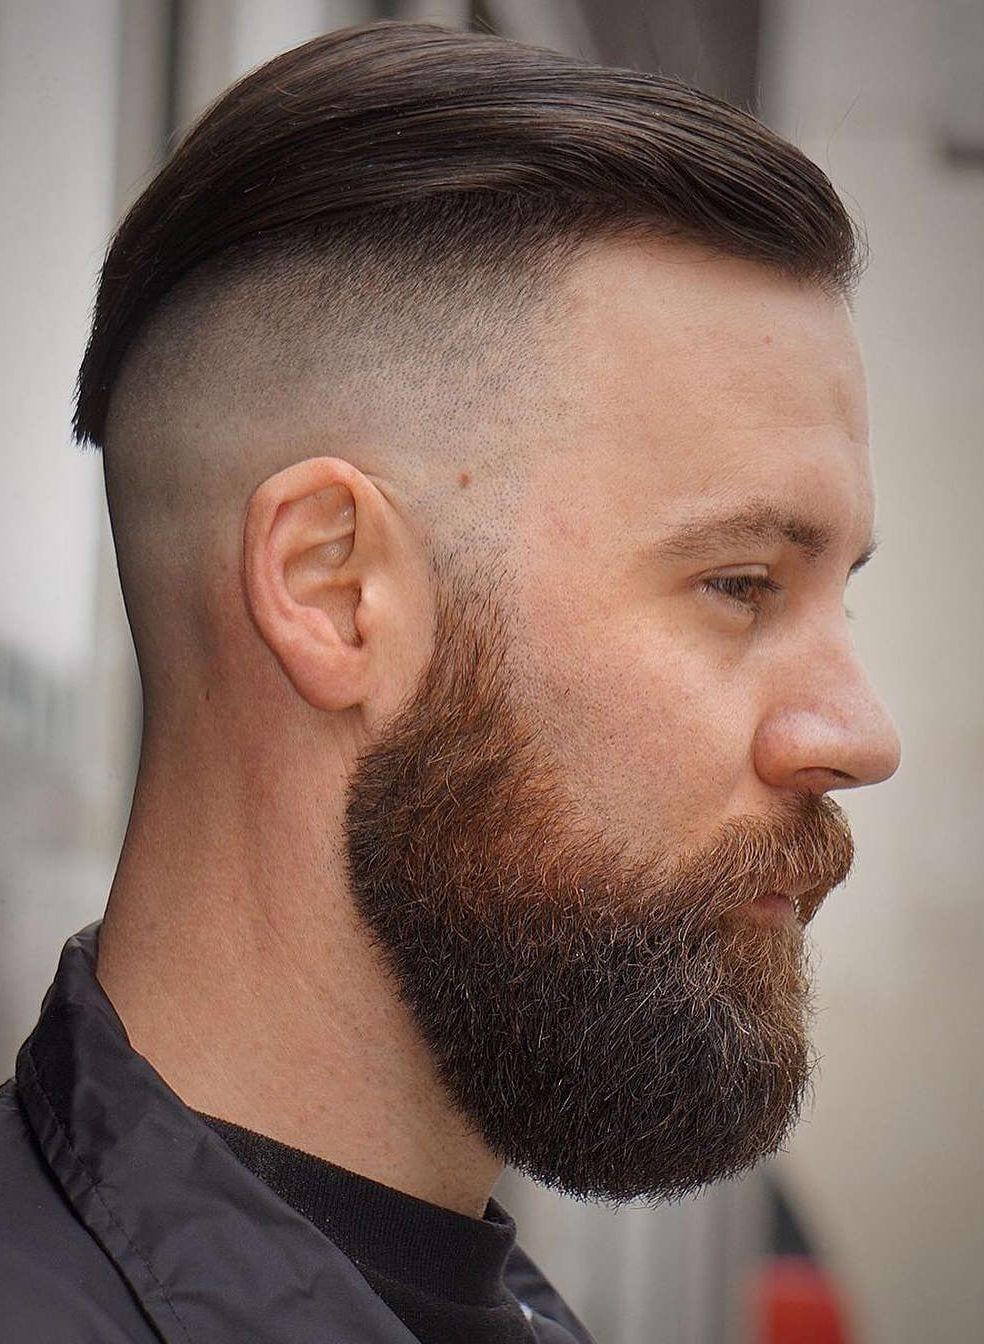 Kiểu tóc undercut cho nam